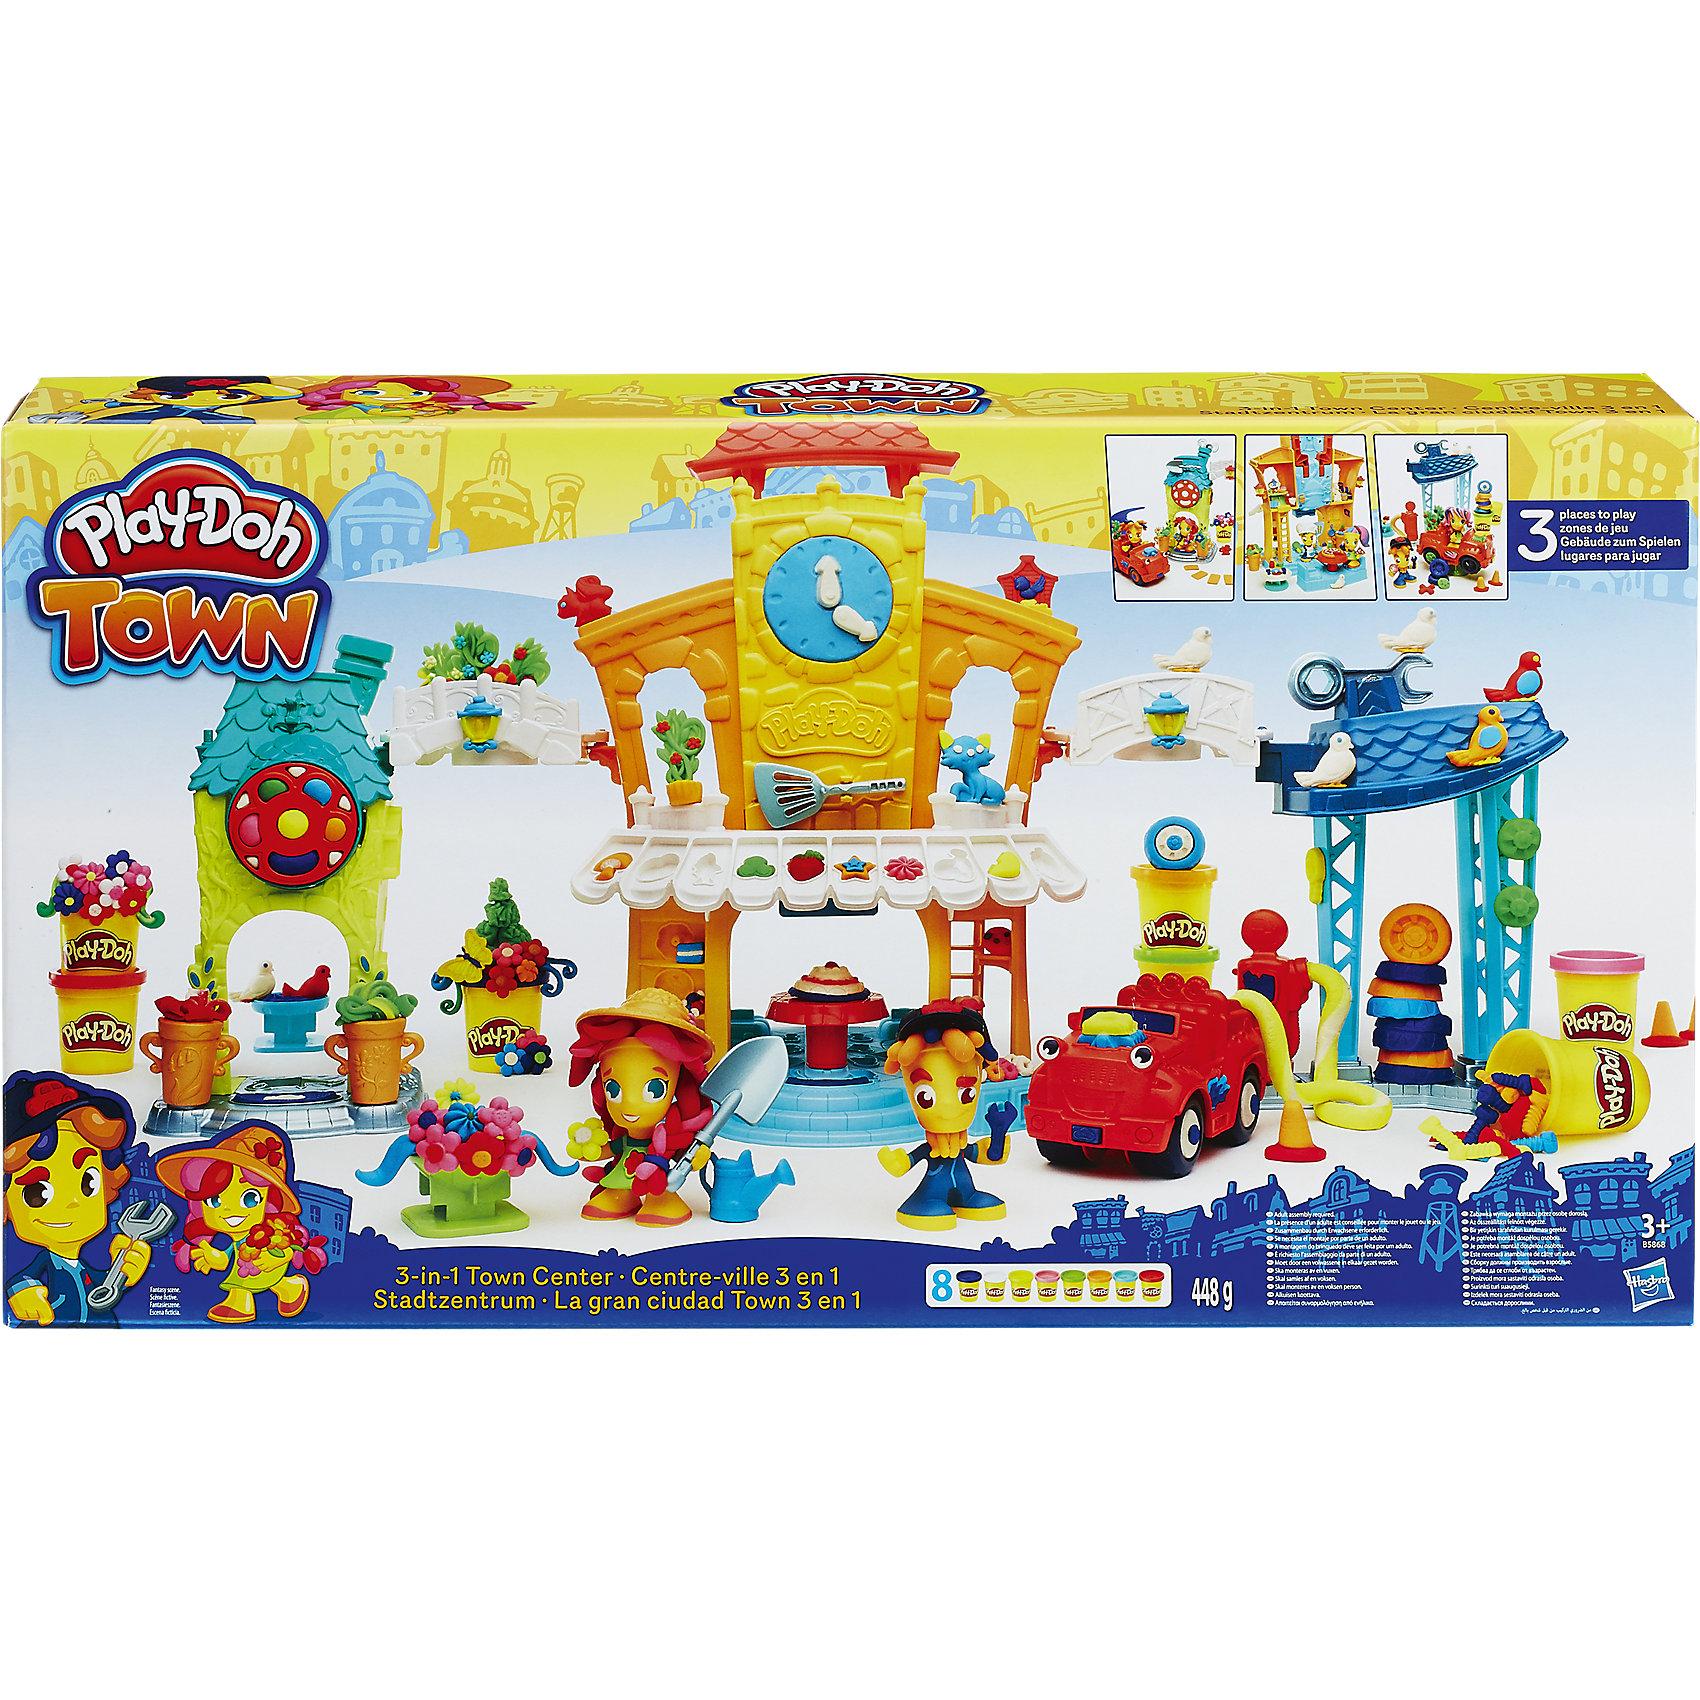 Hasbro Игровой набор Главная улица, Play-Doh Город hasbro play doh b5868 игровой набор главная улица